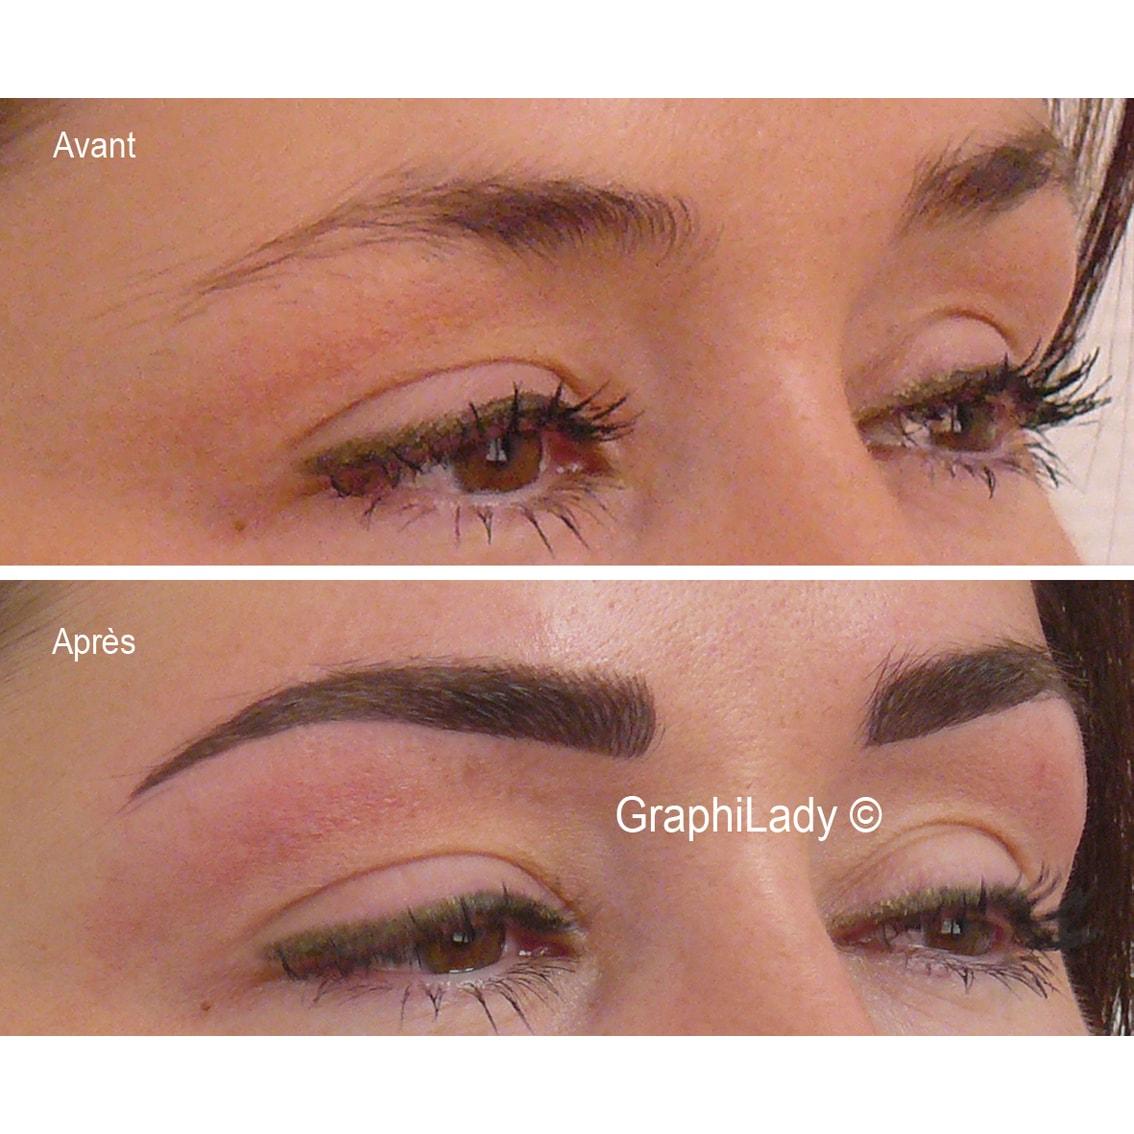 maquillage permanent sourcils 10 graphilady